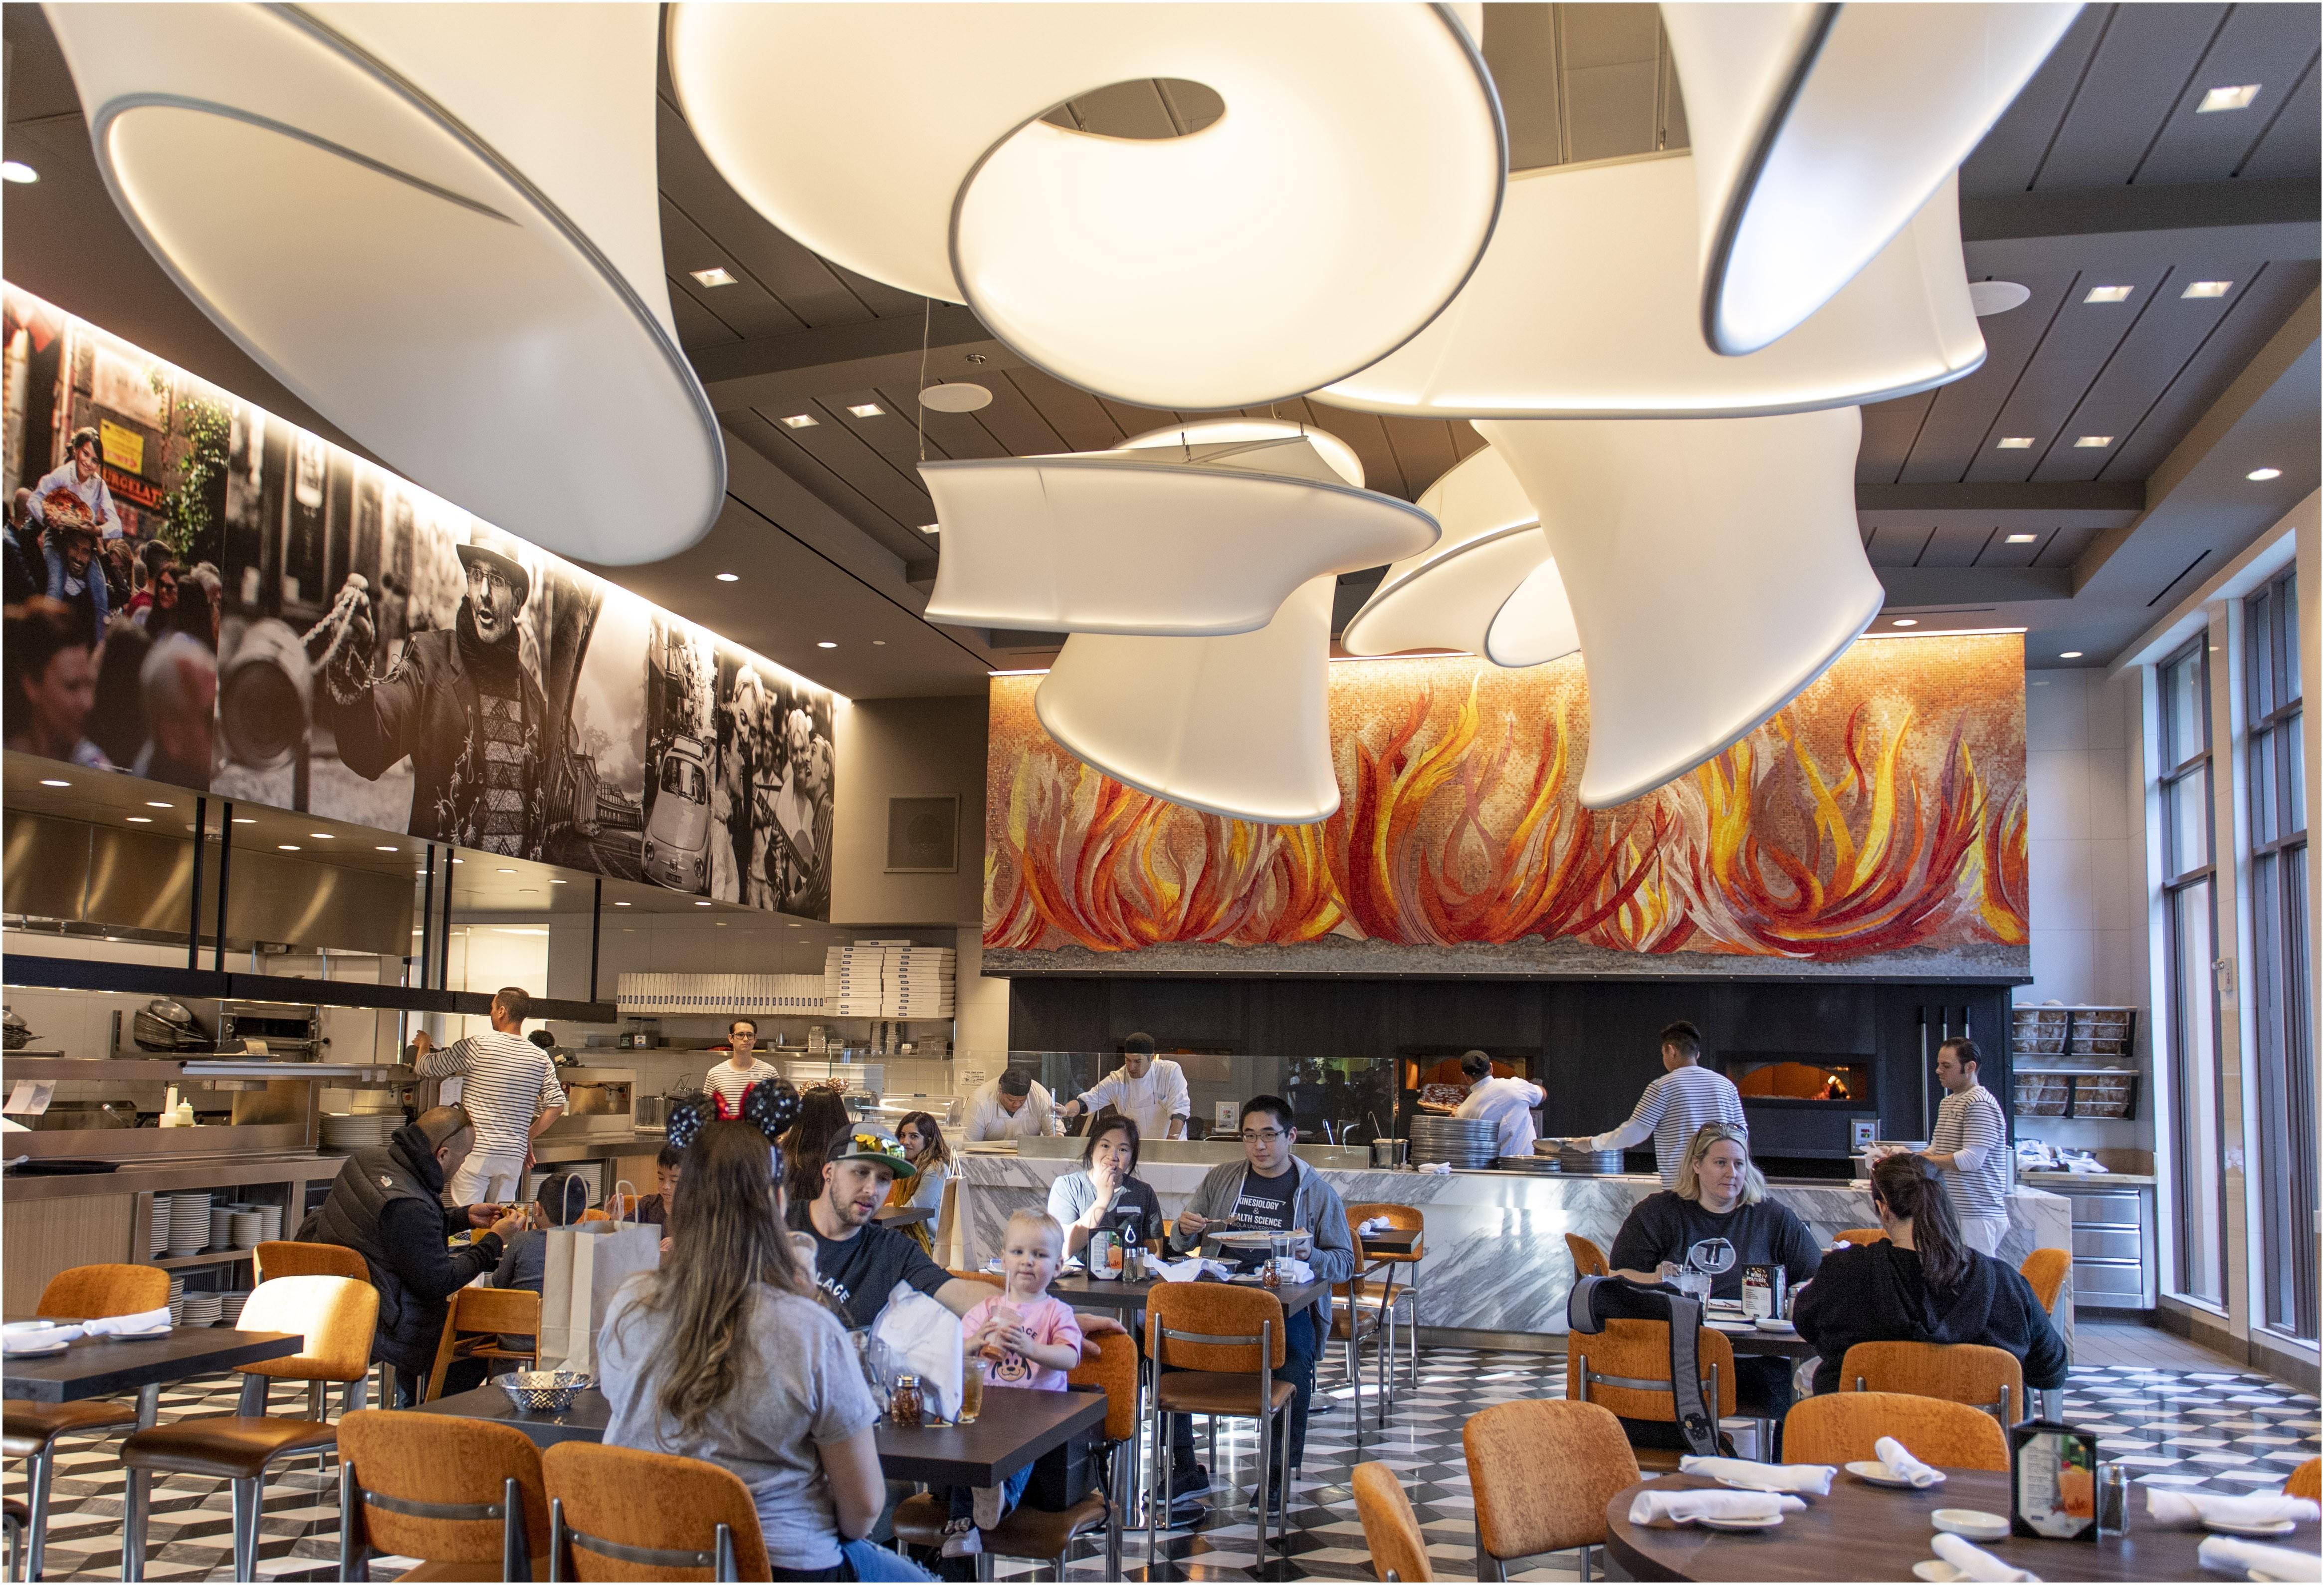 Best Italian Restaurants Near Newport Beach Elegant First Look Naples Ristorante E Bar In Downtown Disney Unveils